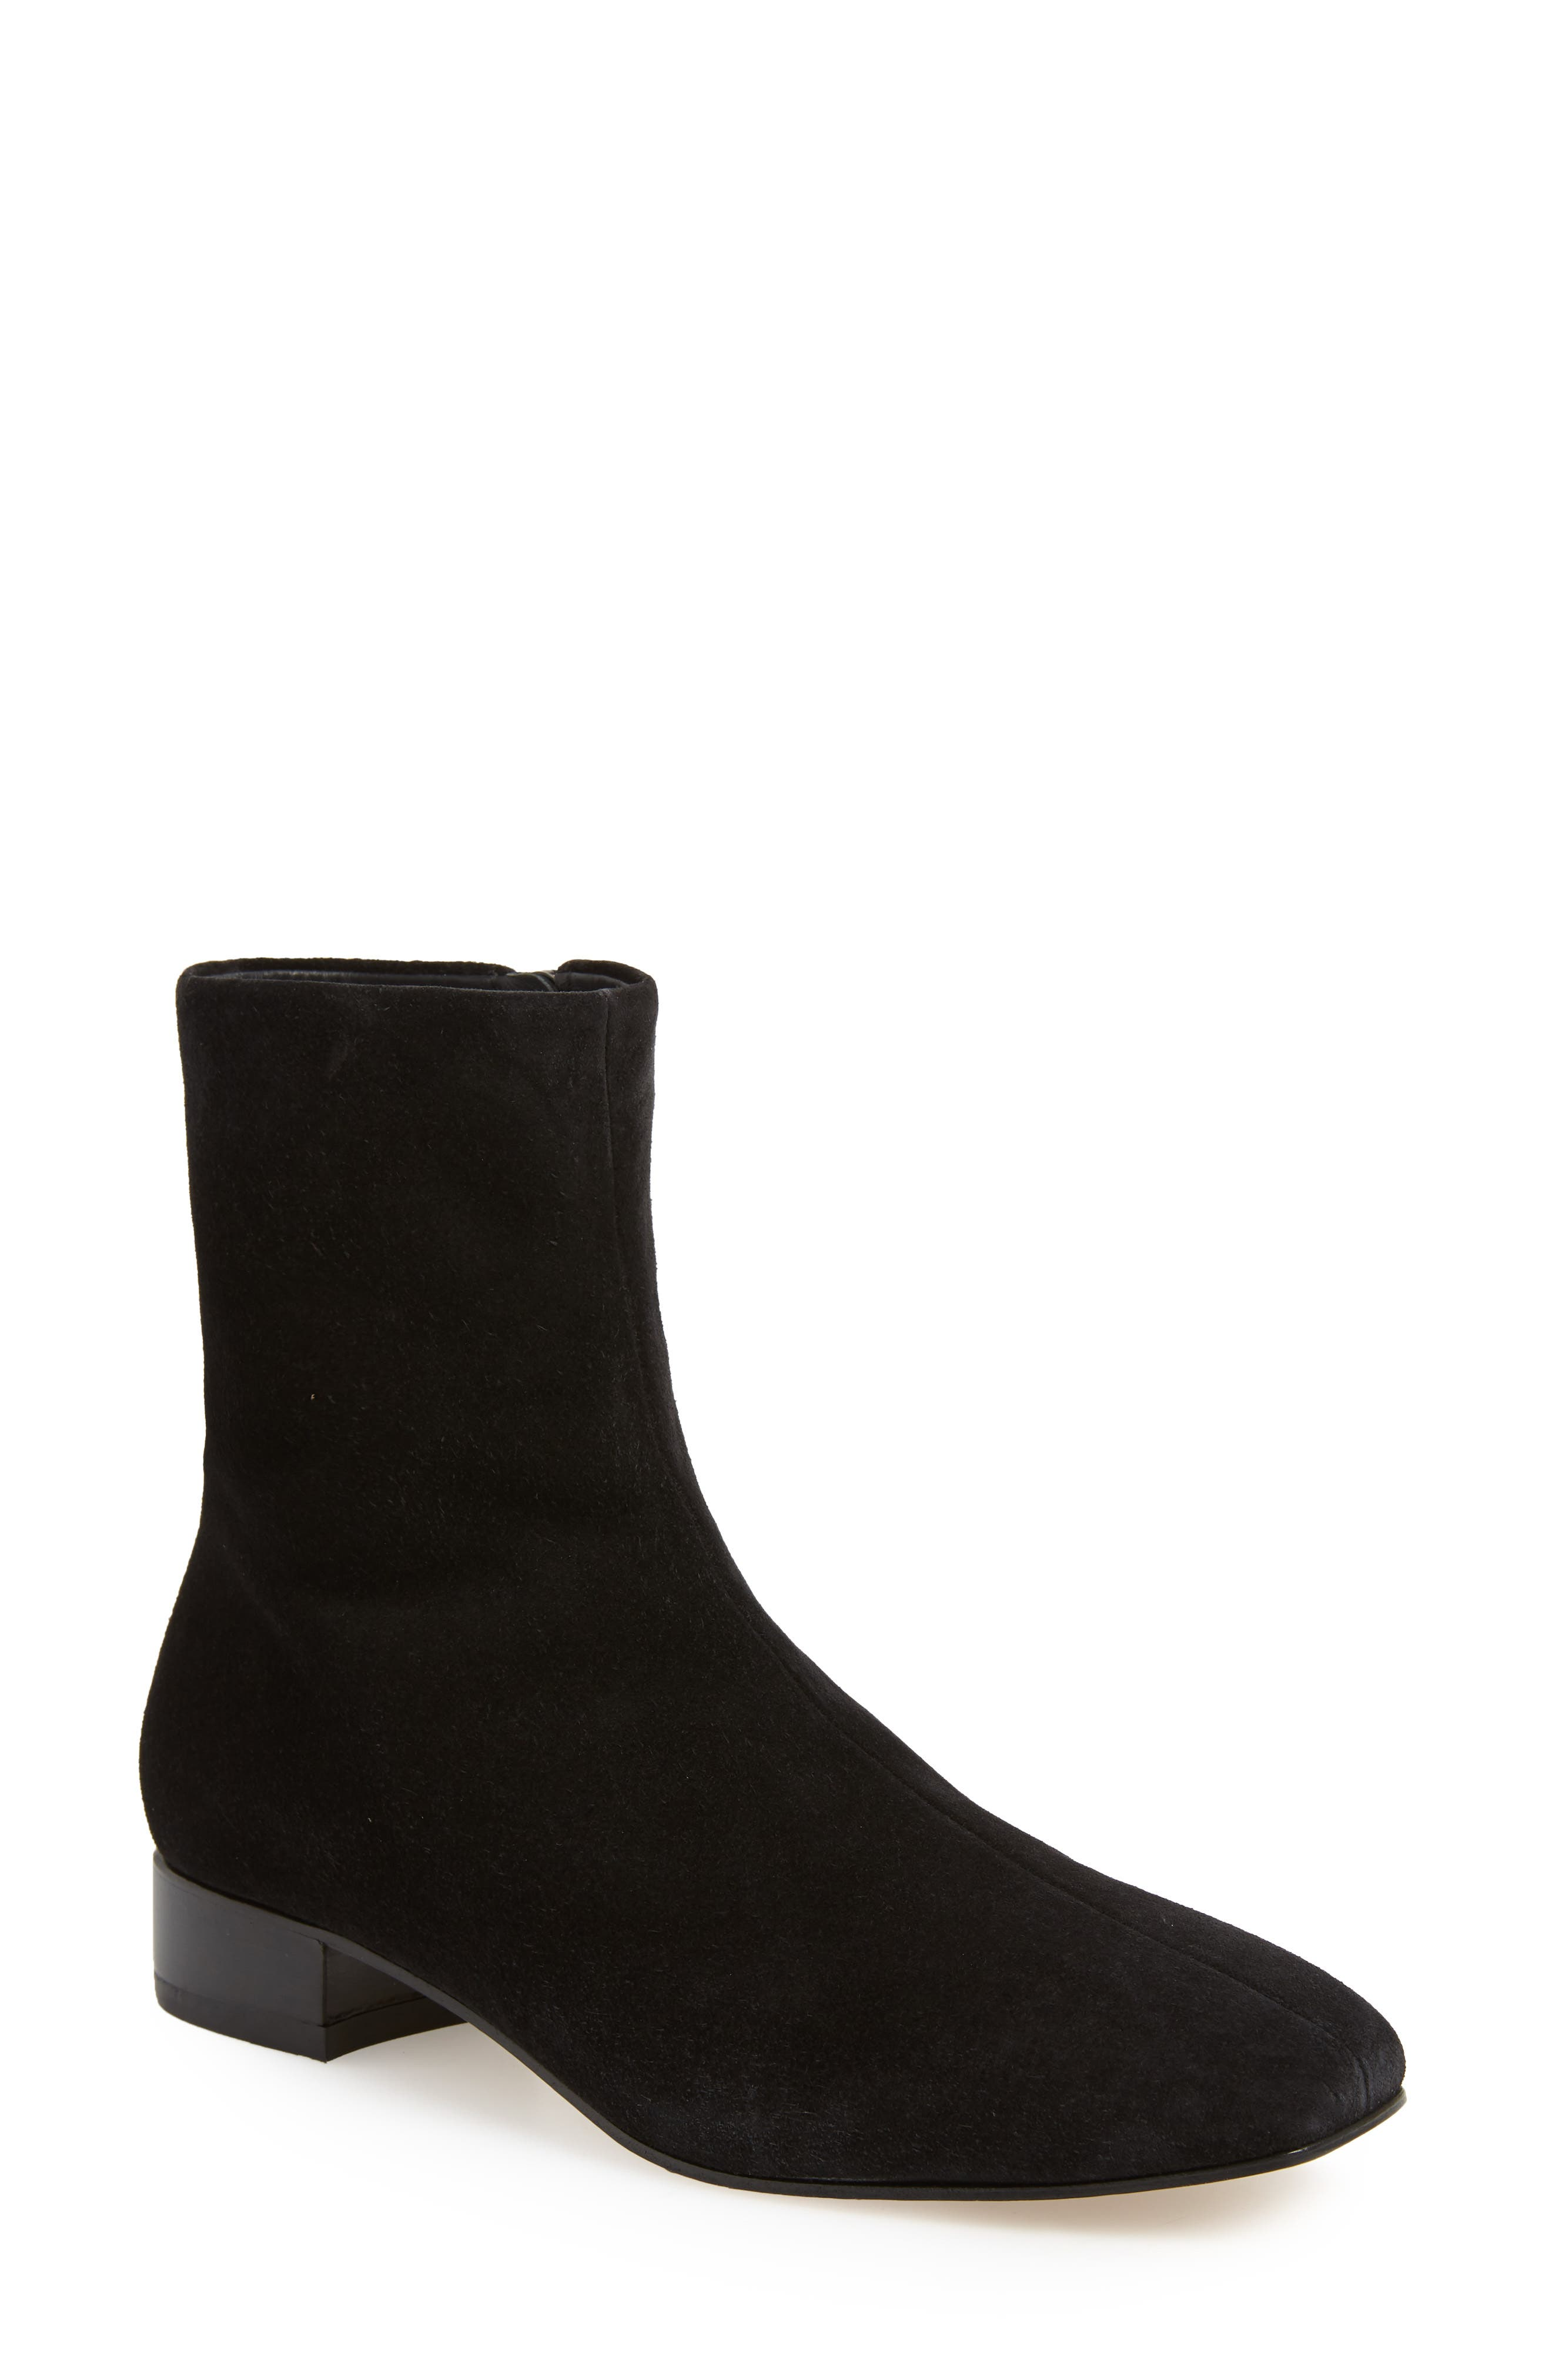 RAG & BONE Aslen Boot, Main, color, BLACK SUEDE